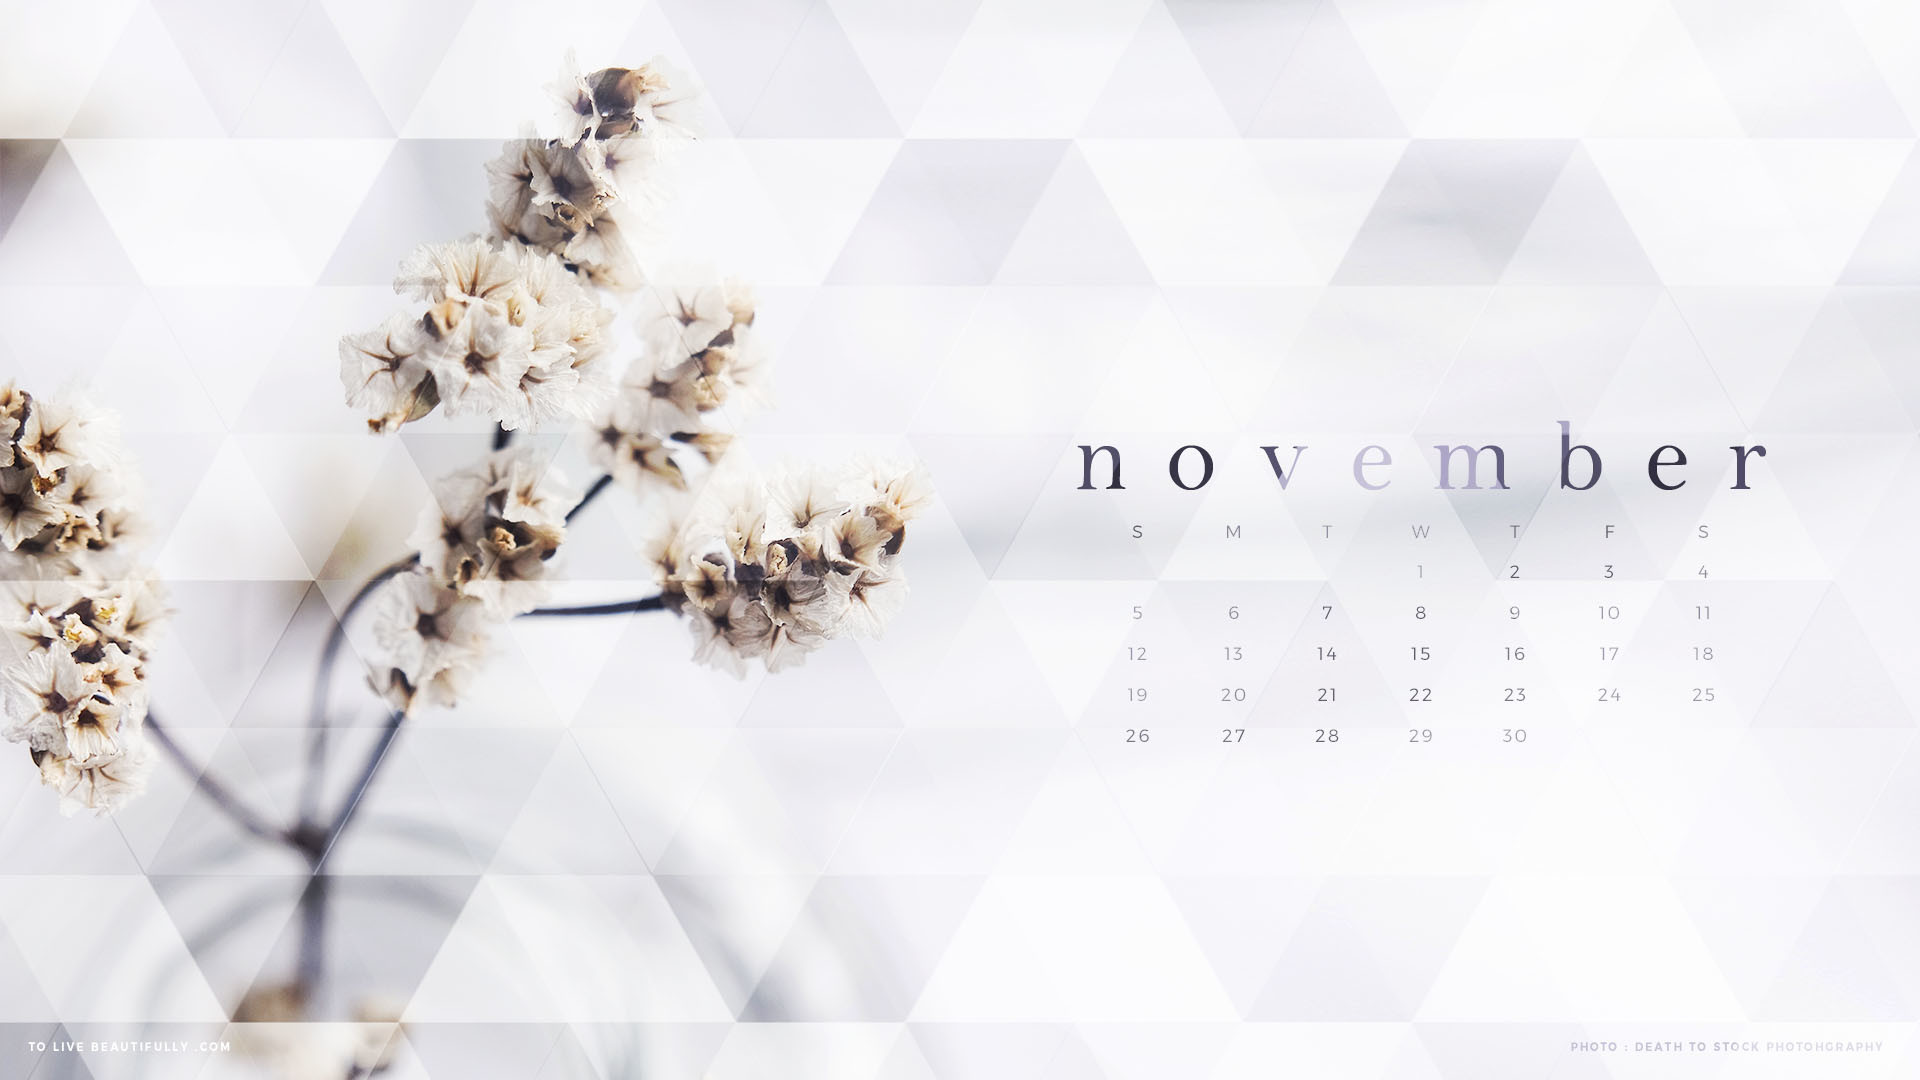 November 2018 Wallpaper 68 Images